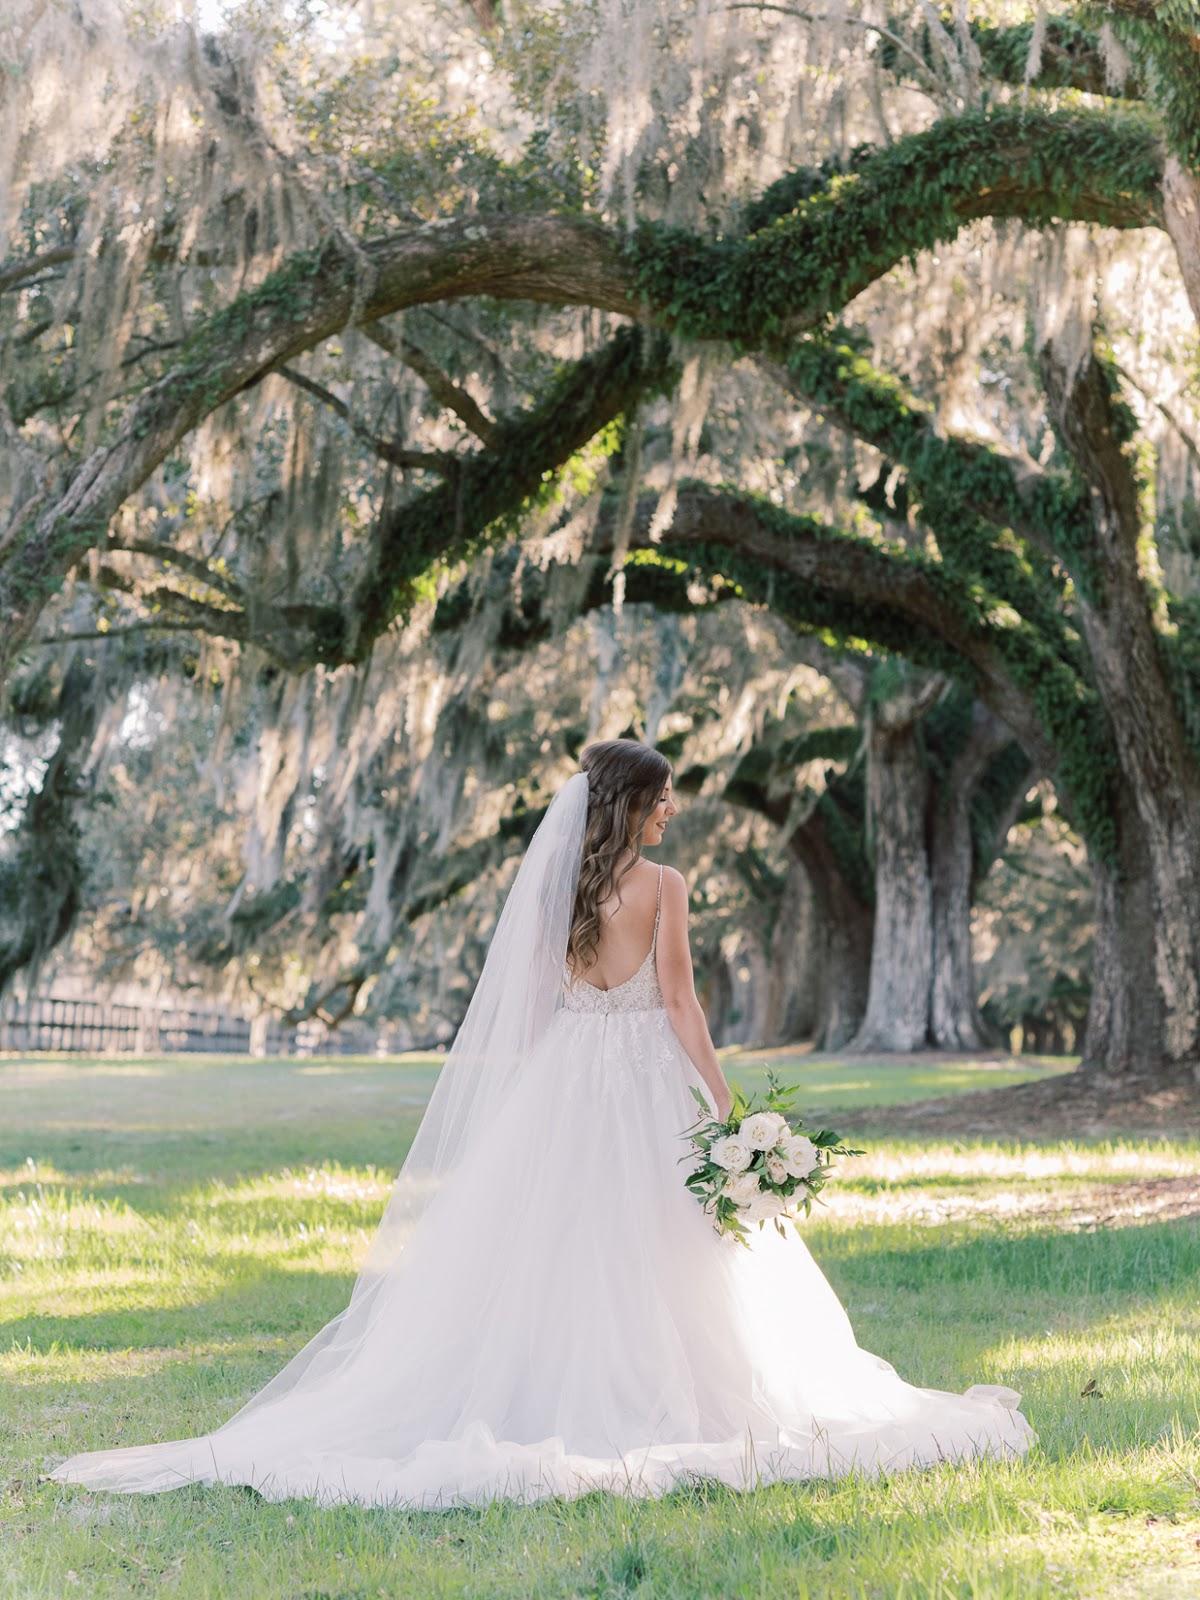 Wedding Dress Details - Chasing Cinderella